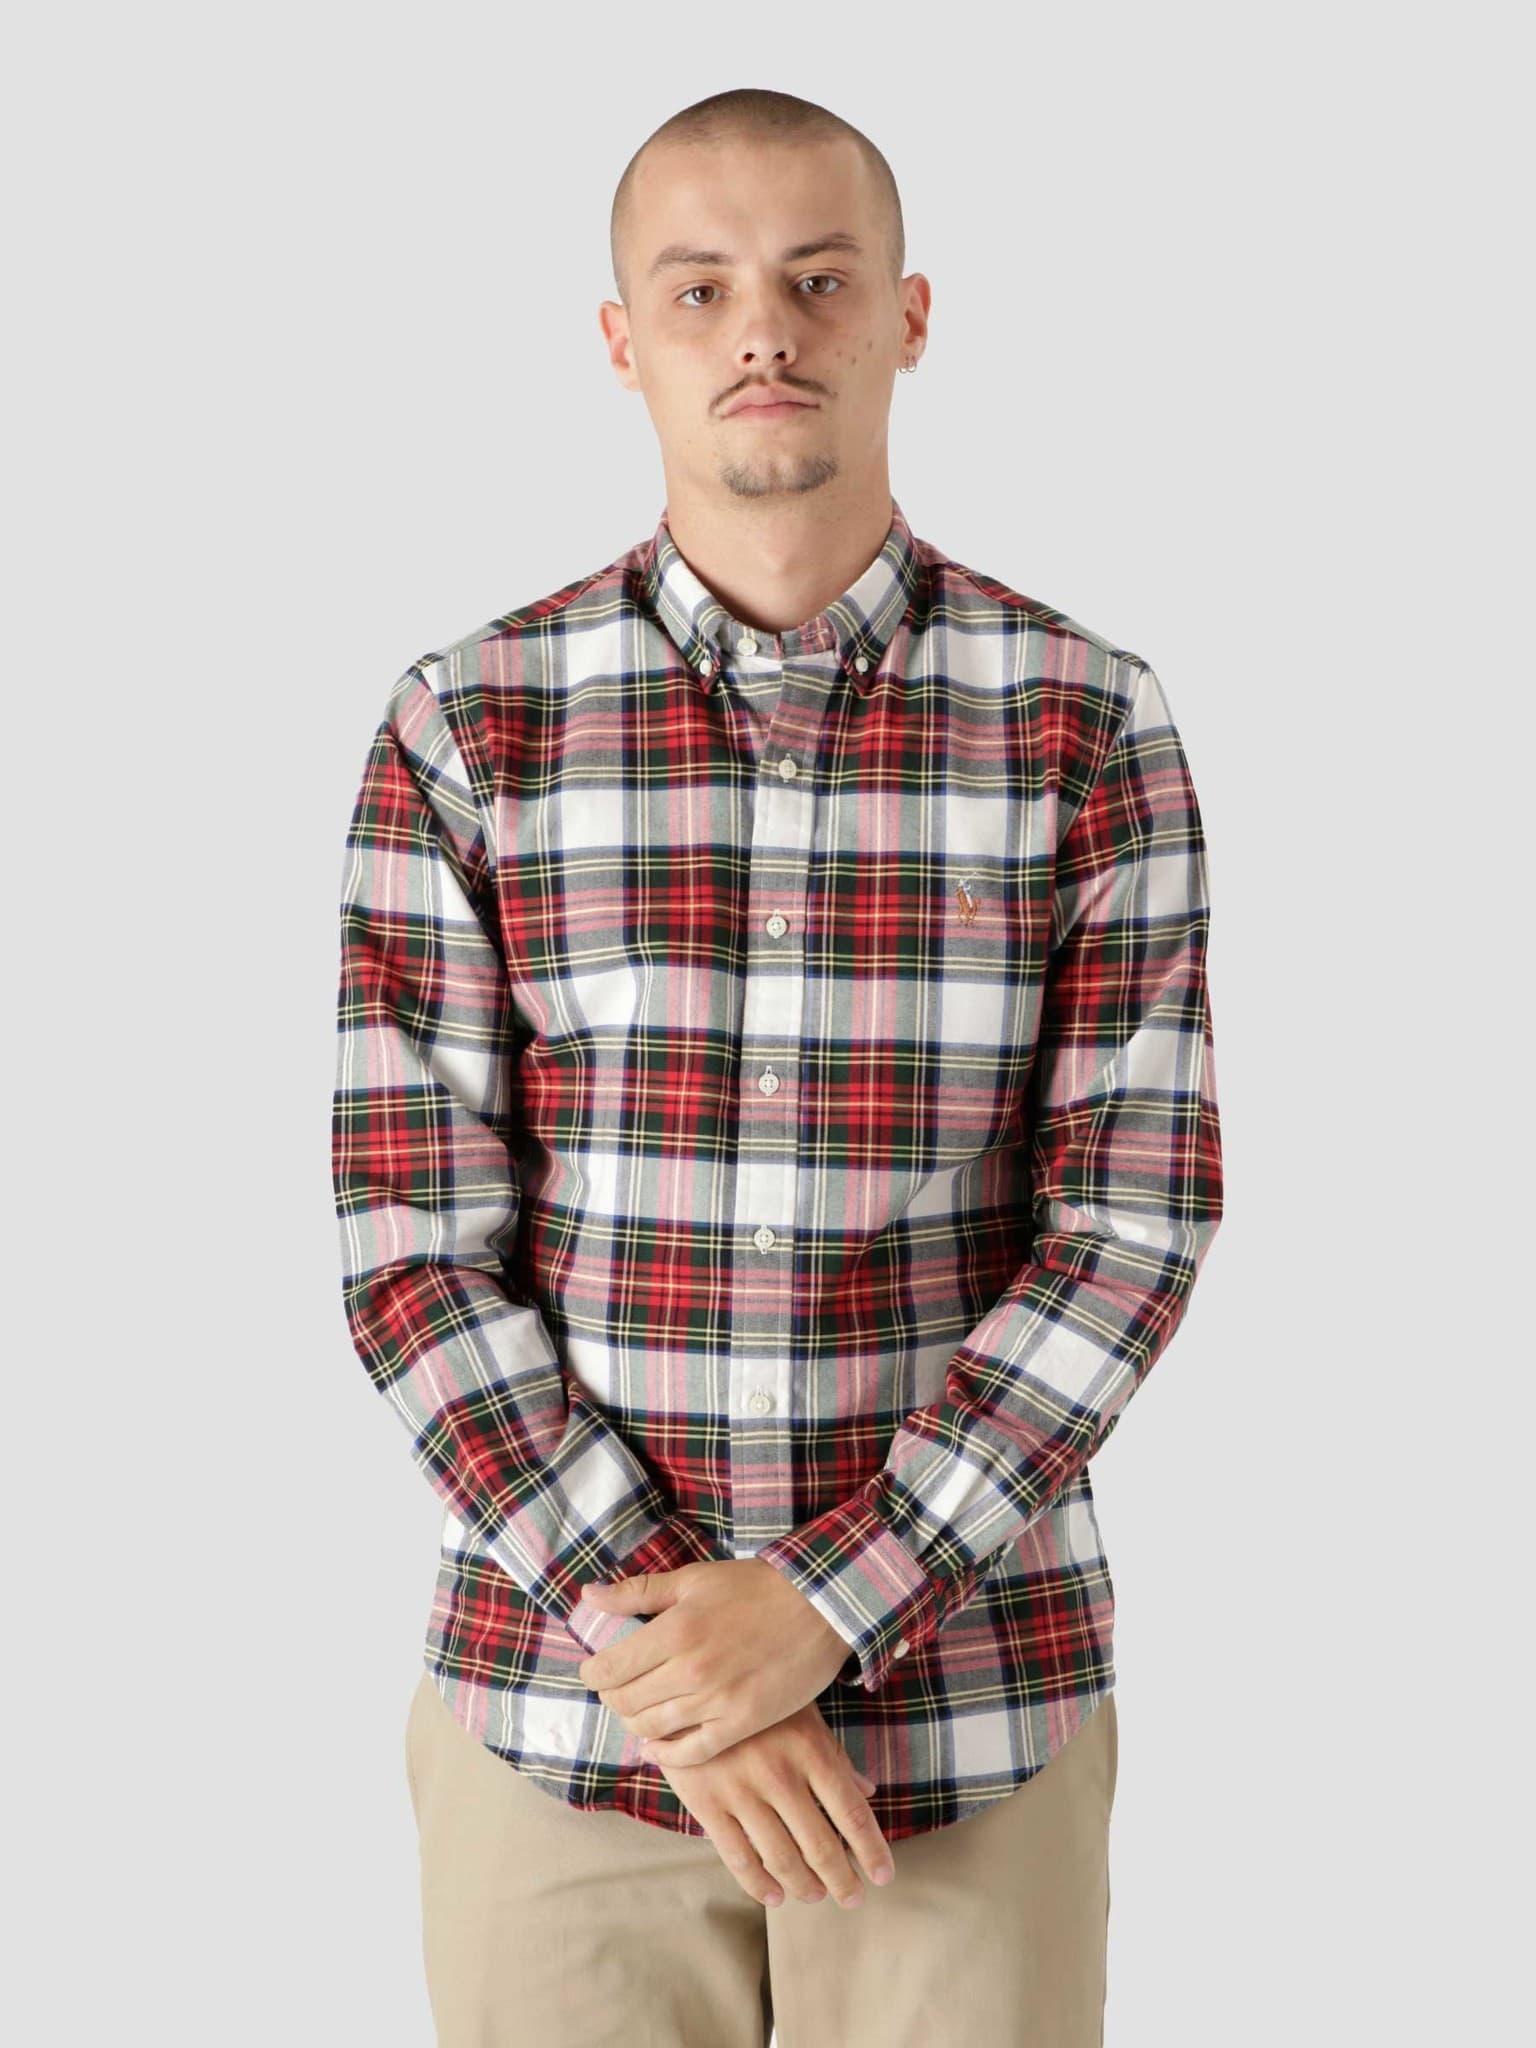 40-1 Yd Oxford Shirt 4903 White Red 710853154003